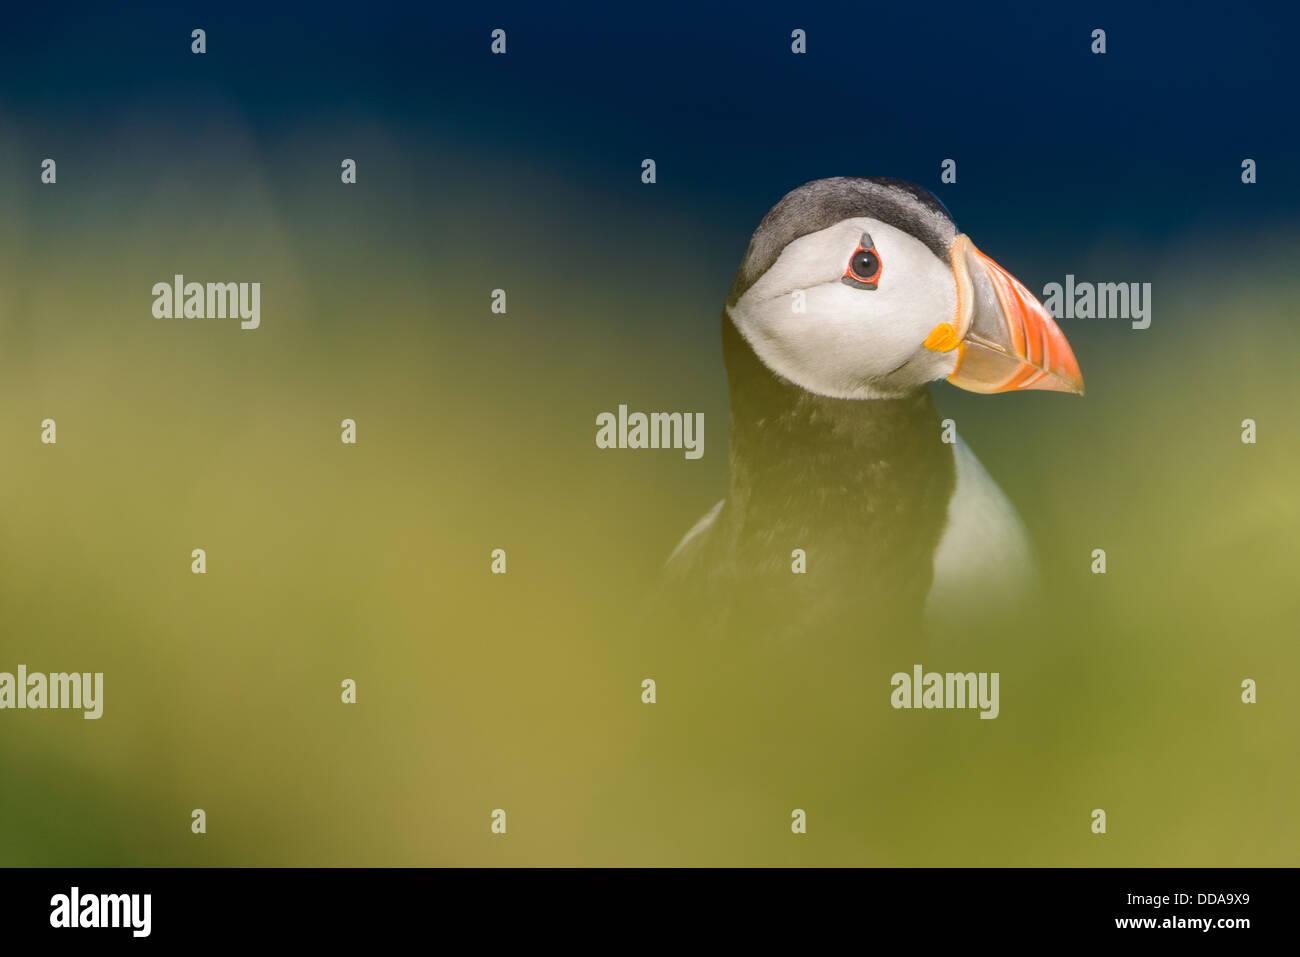 Puffin headshot, Mykines, Faroe Islands - Stock Image